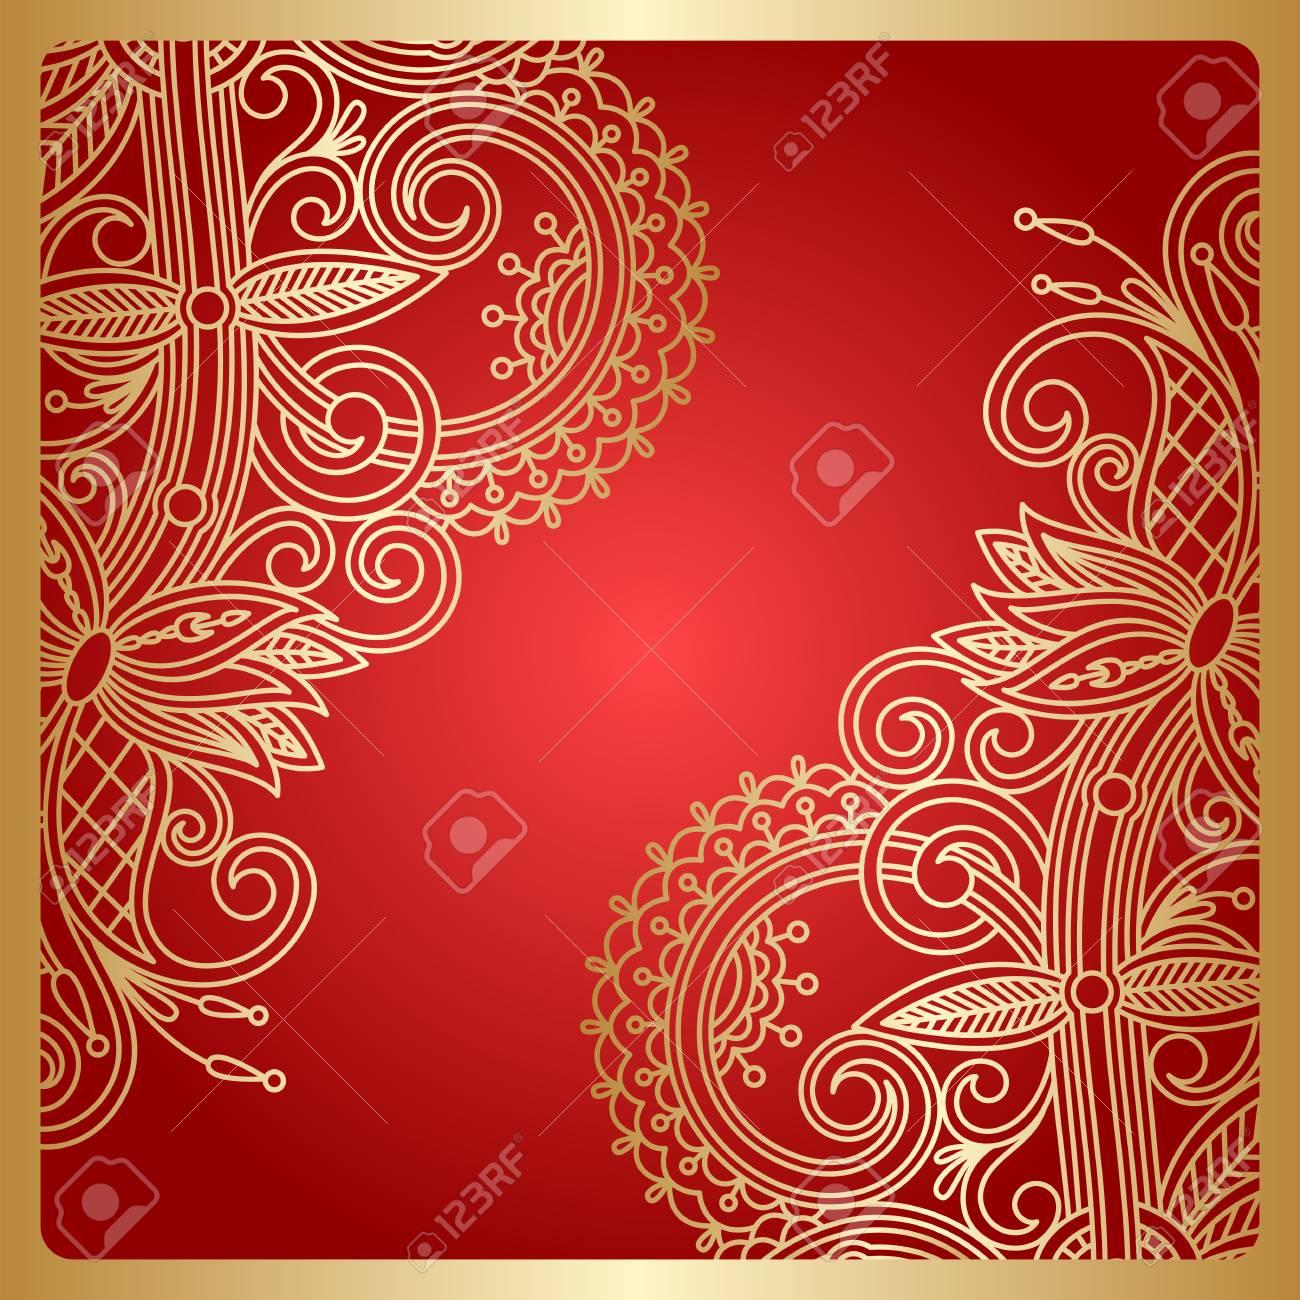 Floral Decorative Background, Template Frame Design For Card ...